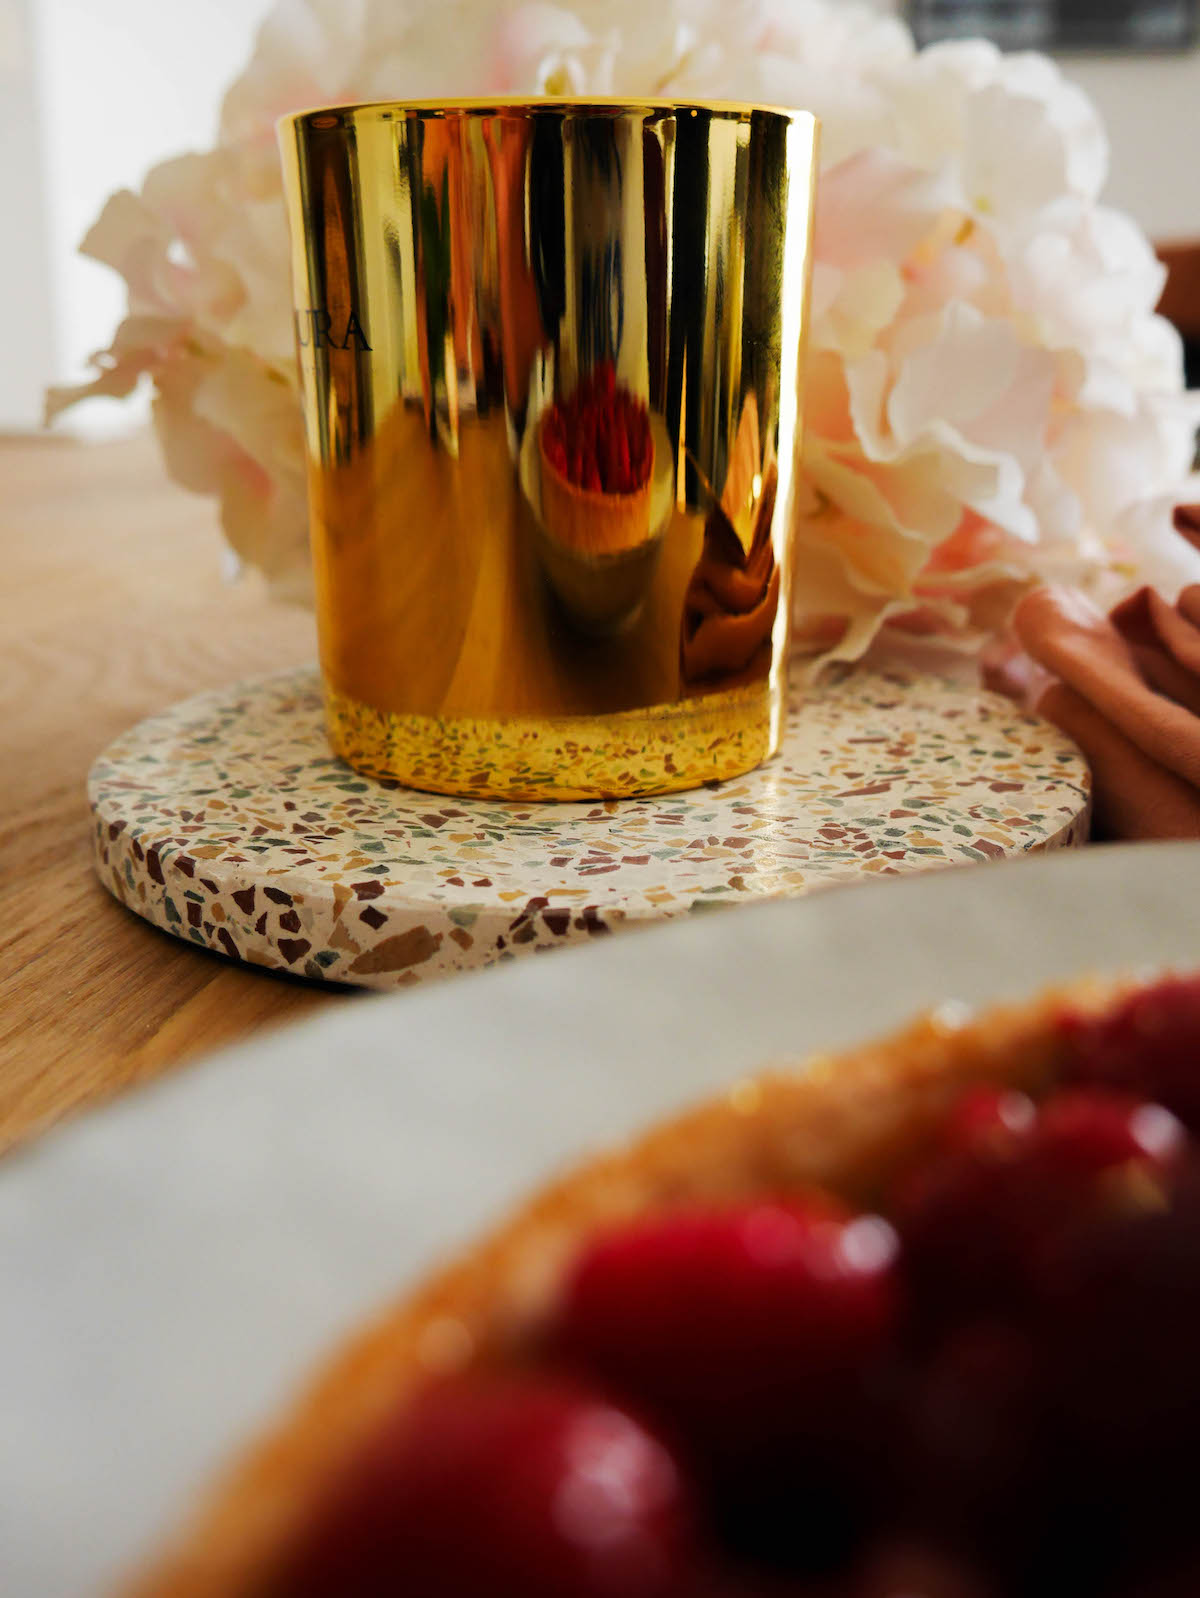 blog déco goûter luxueux bougie dorée chic support rond terrazzo pierre